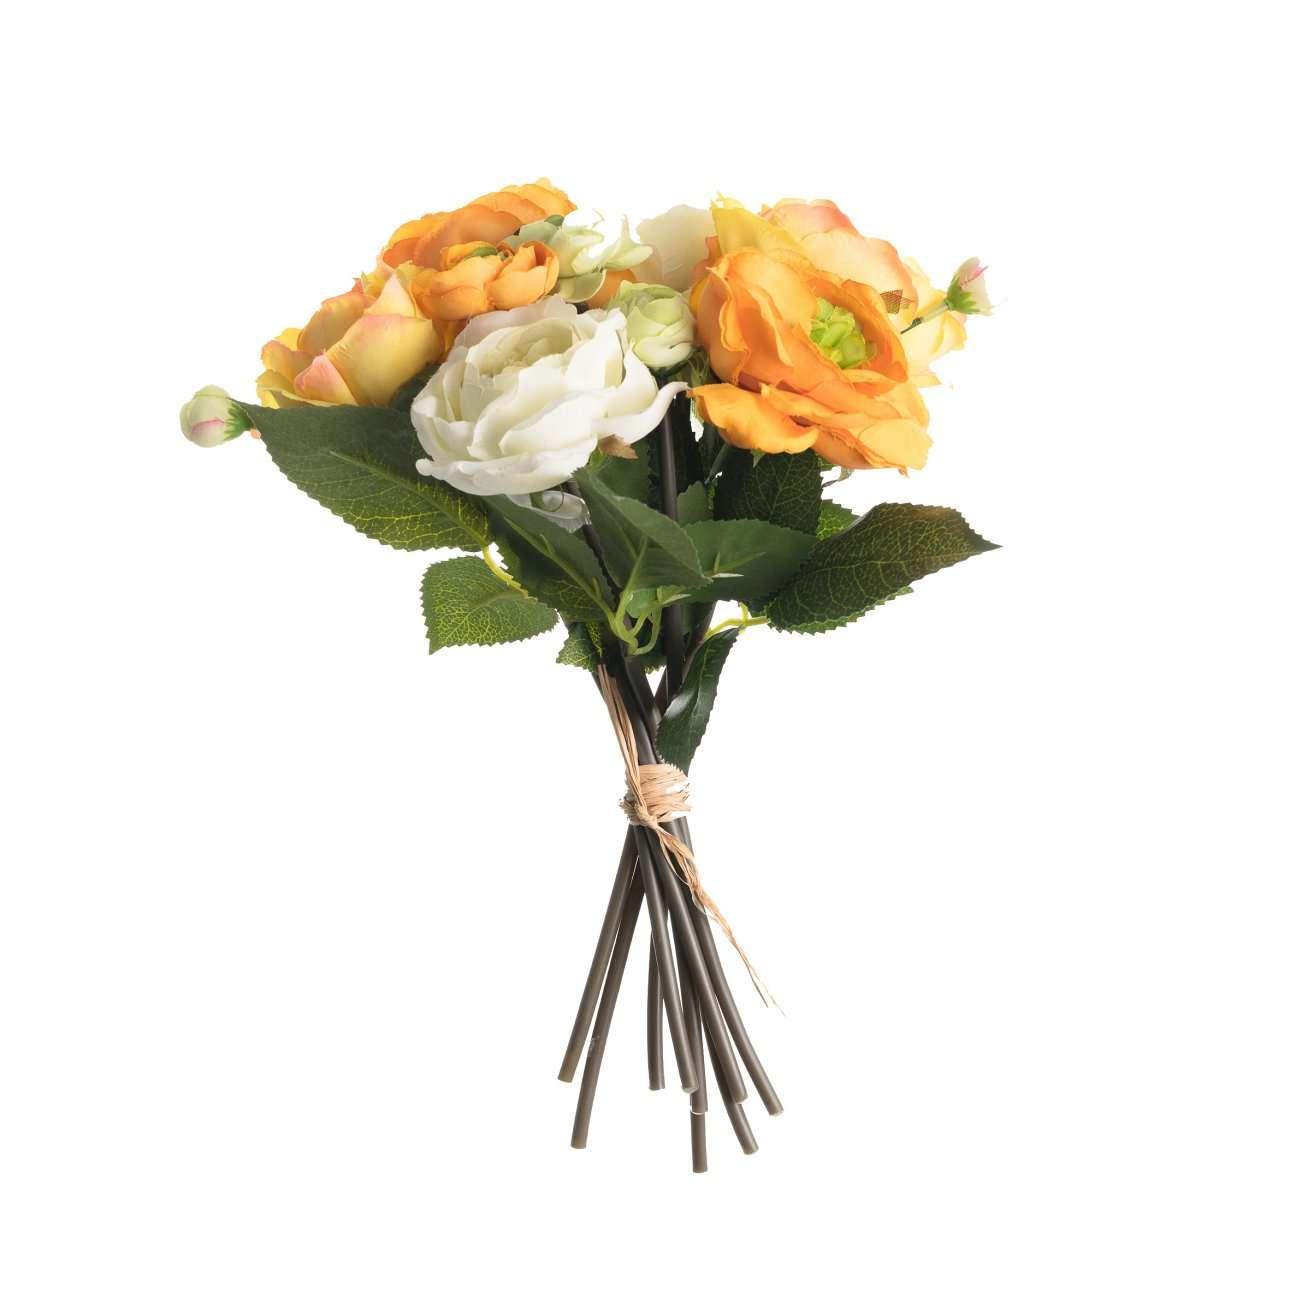 Artificial Orange/White Roses Bouquet H 29 cm